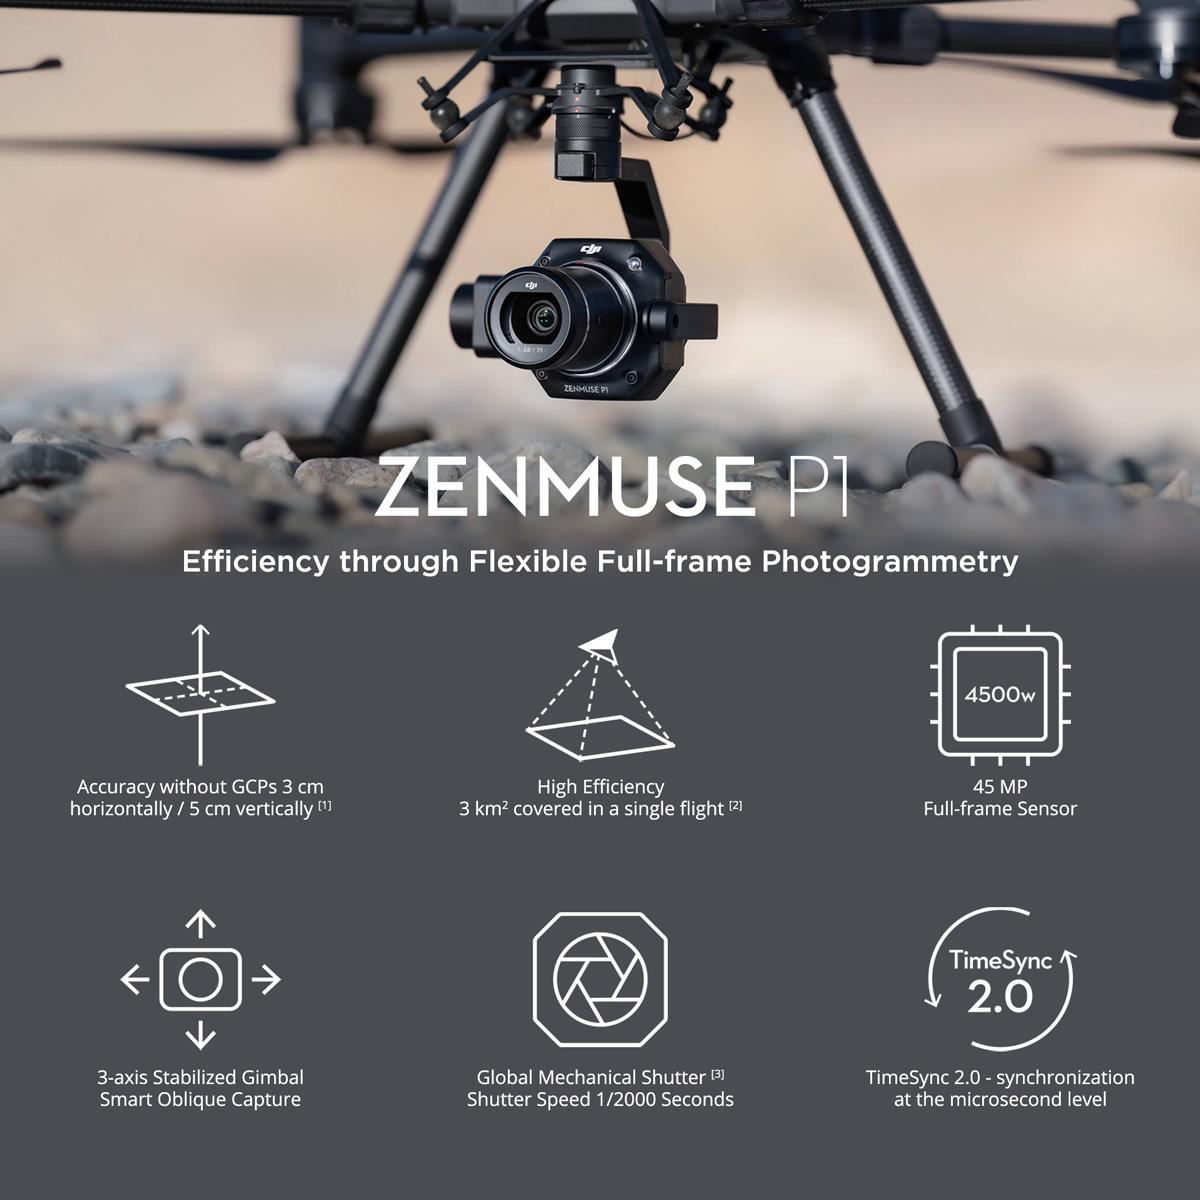 DJI Zenmuse P1 - Efficiency through Flexible Full-frame Photogrammetry